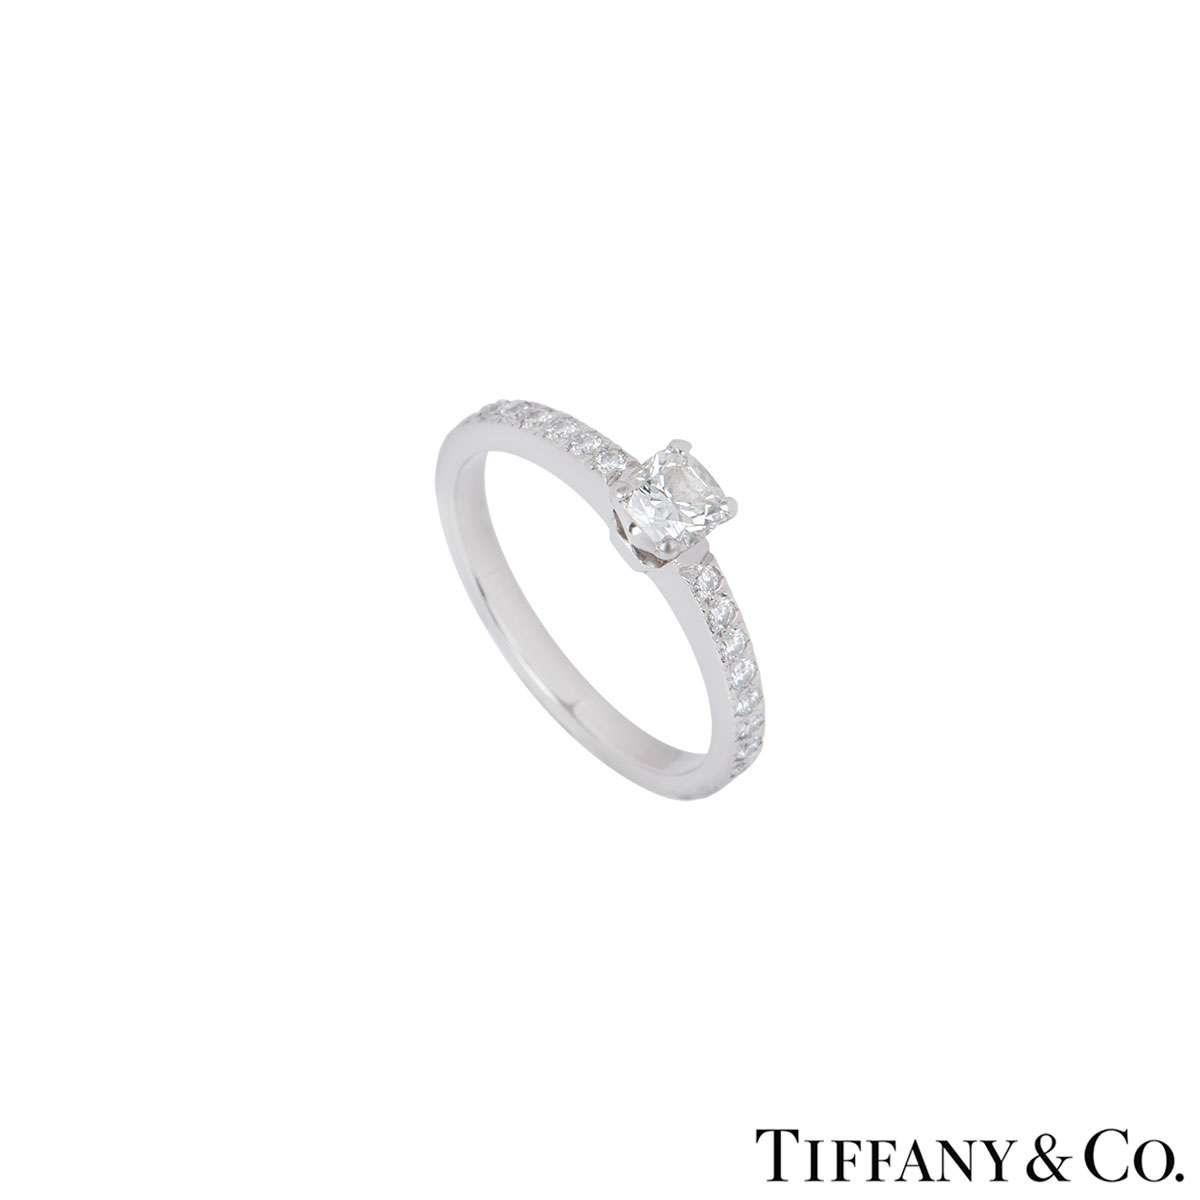 Tiffany & Co. Platinum Diamond Ring 0.33ct G/VS1